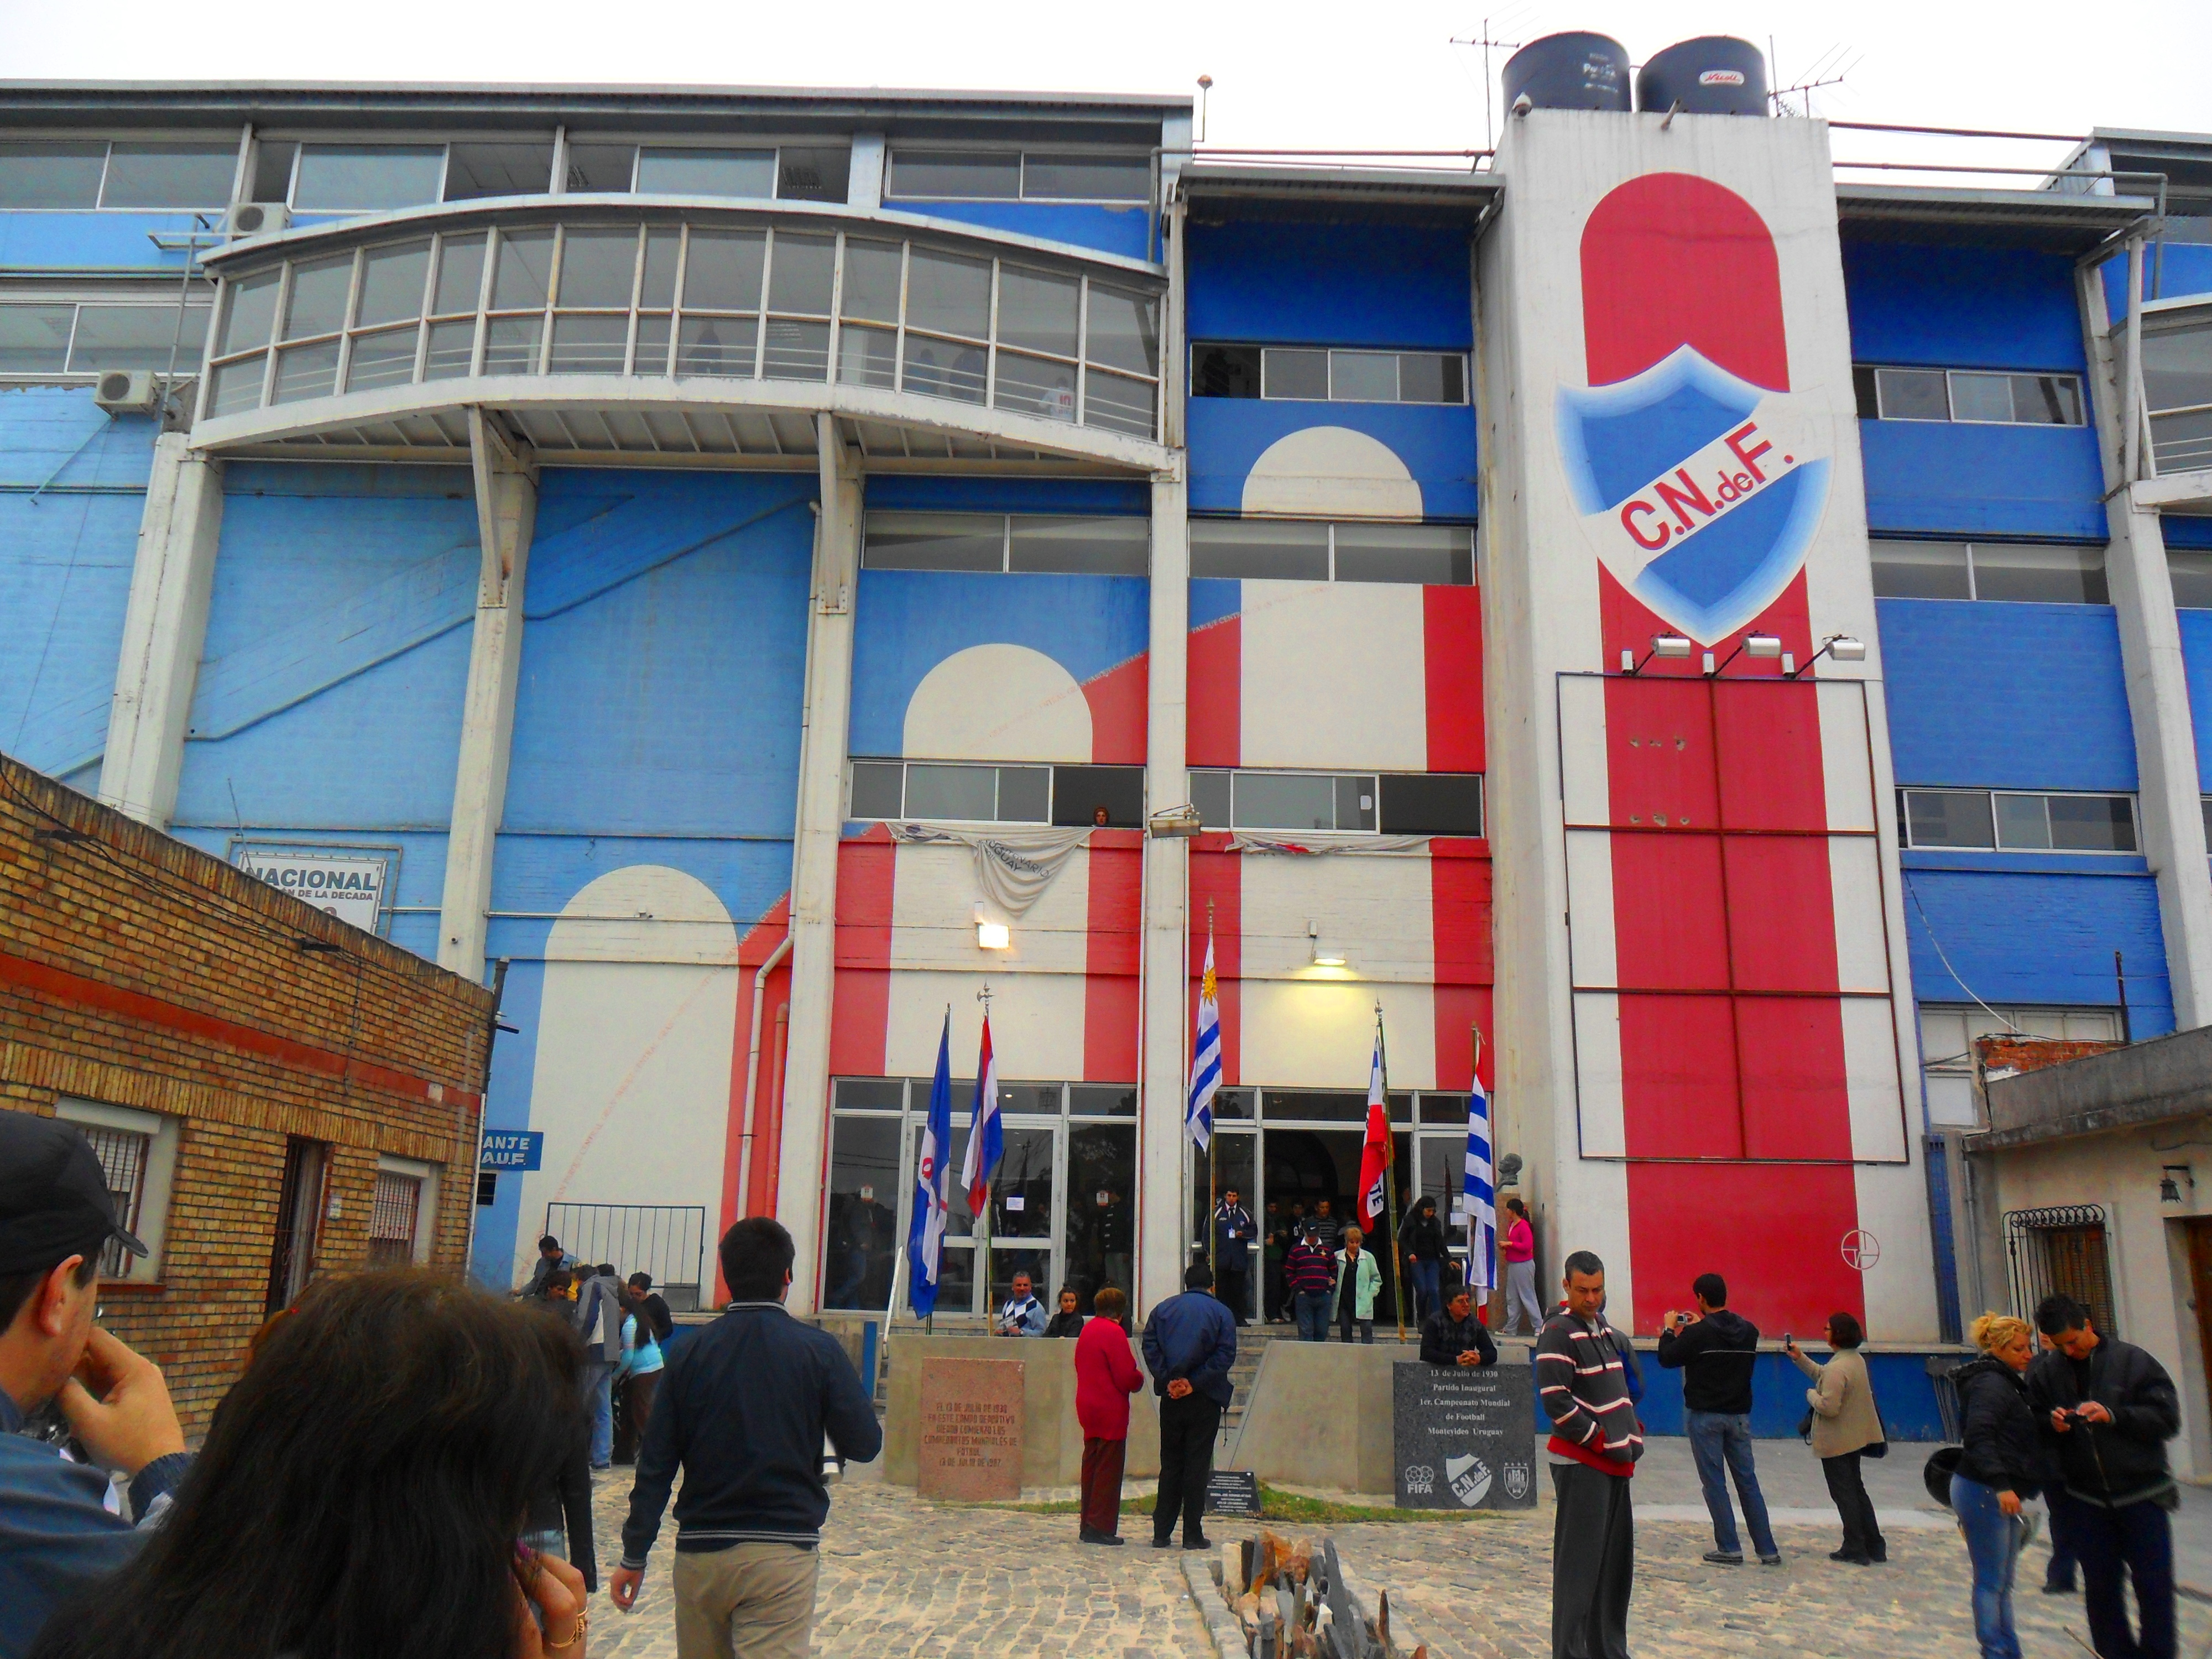 https://upload.wikimedia.org/wikipedia/commons/5/52/Fachada_Estadio_Gran_Parque_Central.JPG